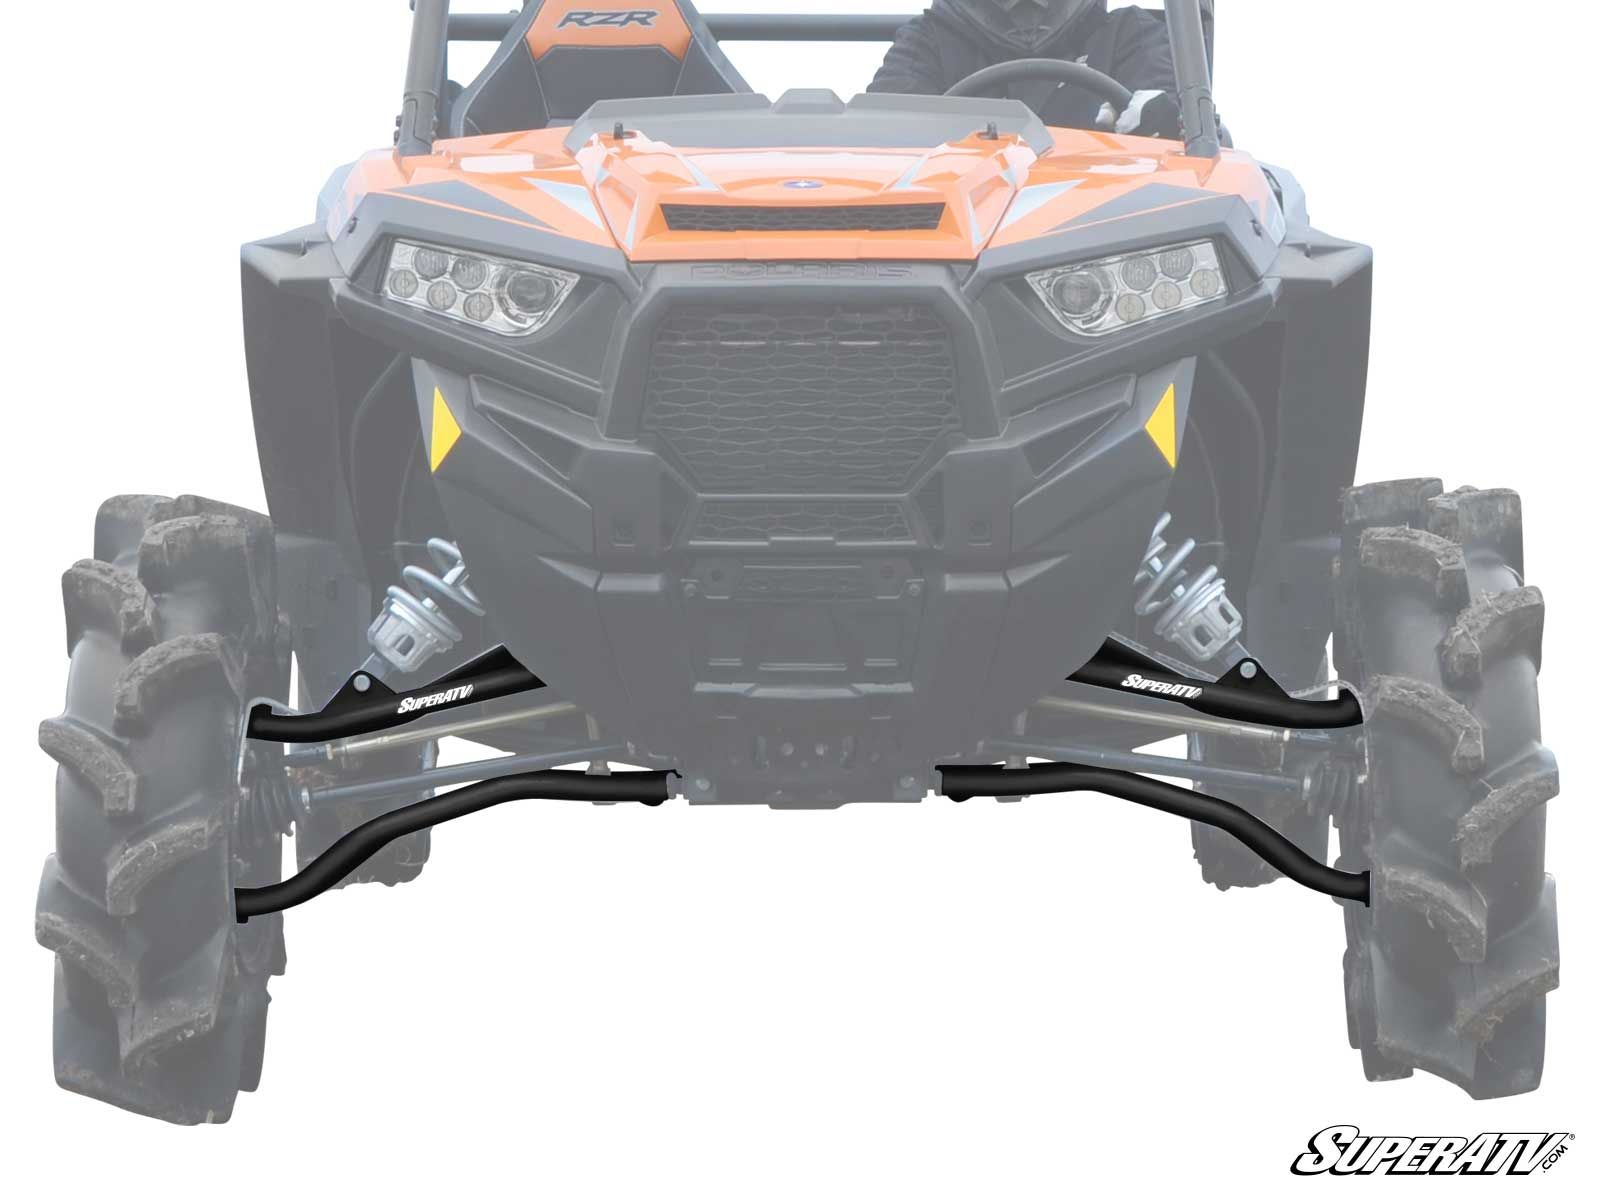 Polaris Rzr Xp 1000 Turbo >> Superatv Polaris Rzr Xp 1000 Xp Turbo High Clearance 1 5 Forward Offset A Arms Chromoly